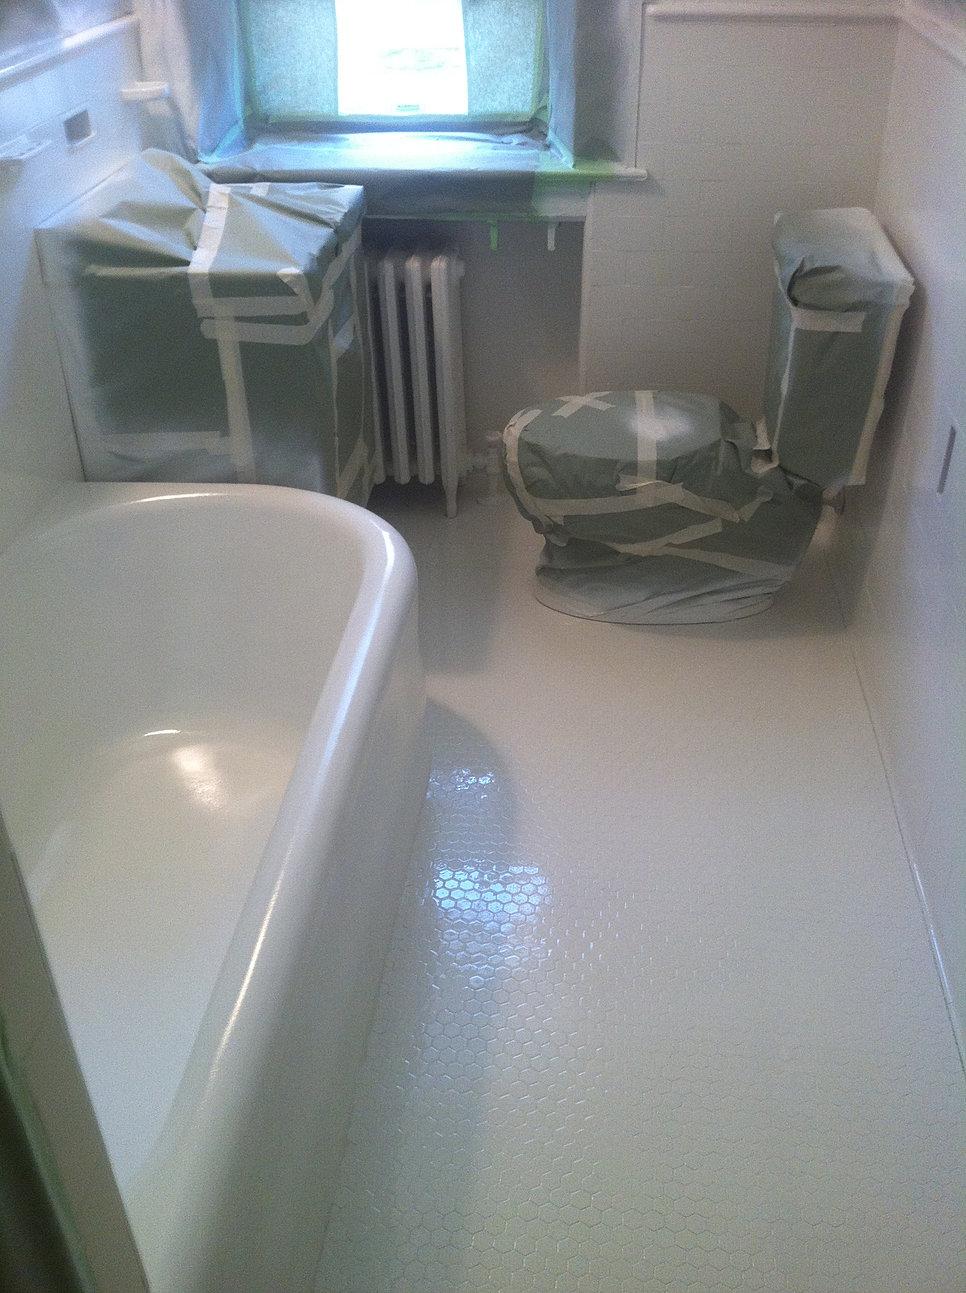 Charming Bath Tub Paint Big Bathtub Repair Contractor Solid Painting A Tub How To Paint Your Bathtub Young Painting Bathtubs Soft How To Paint A Bath Tub